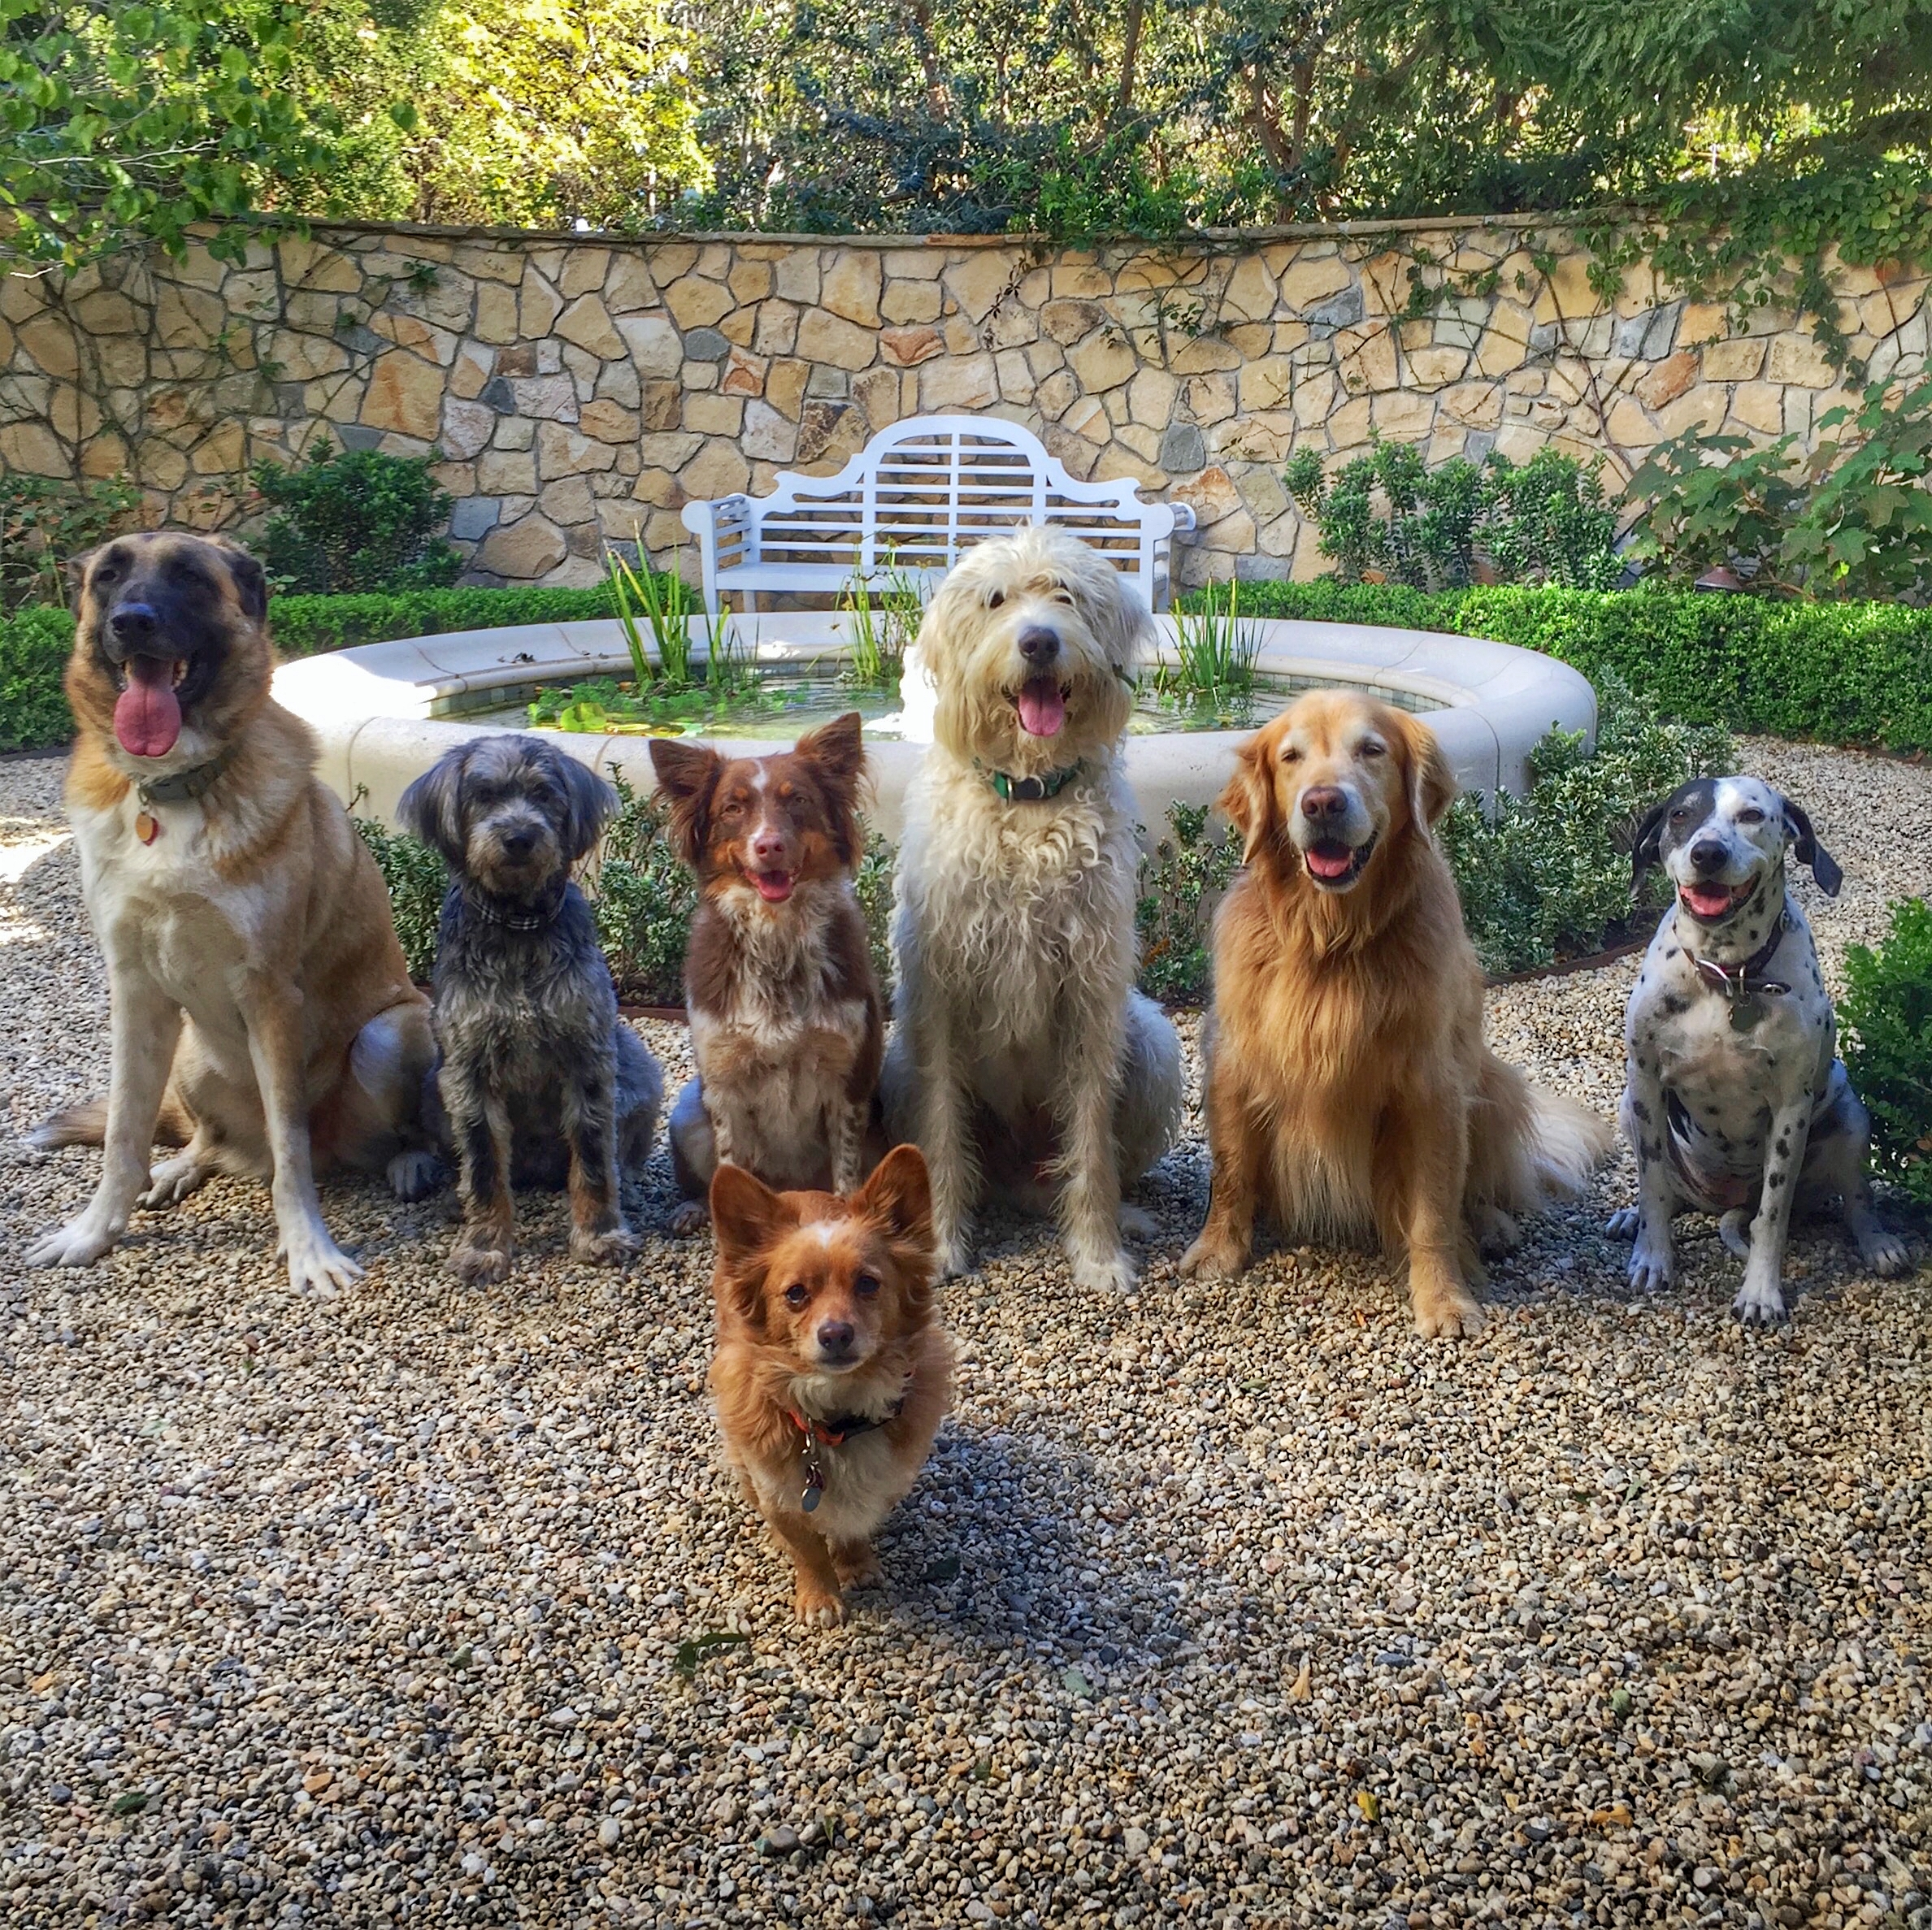 Left to Right: Chavo, Jagger, Pasha, Mr Fox, Jack, Bosco & Zara